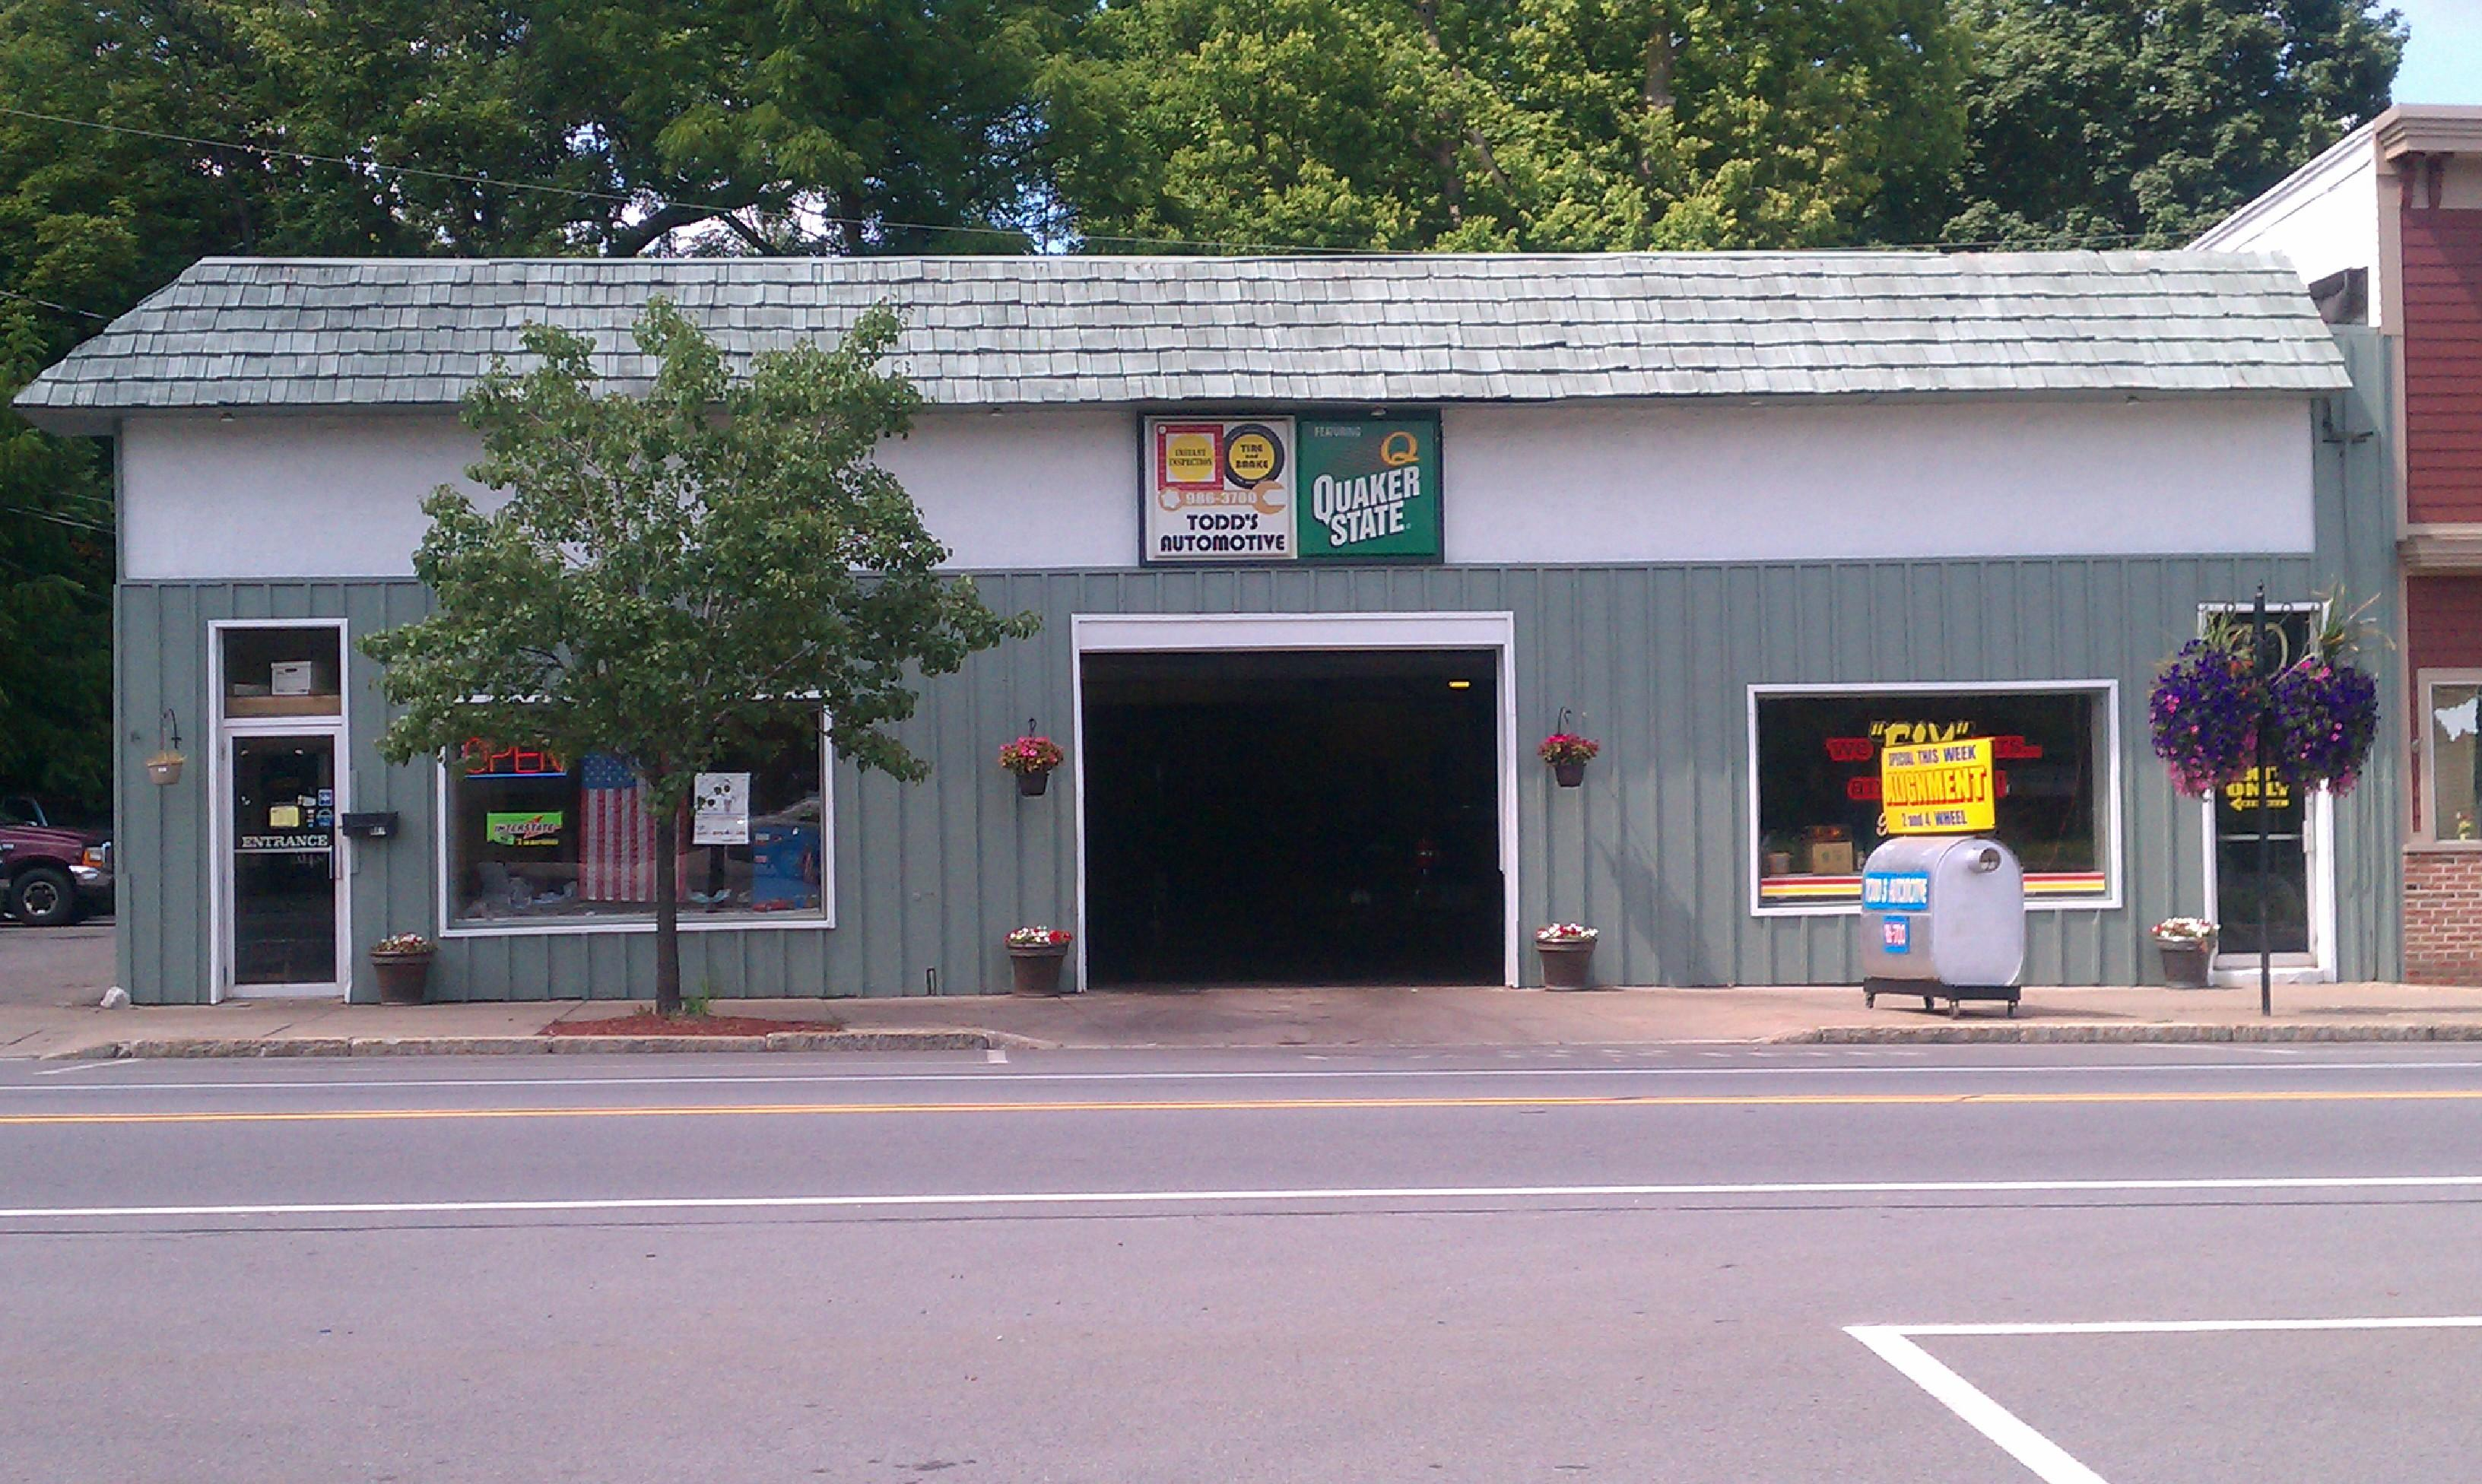 Todd's Automotive Inc